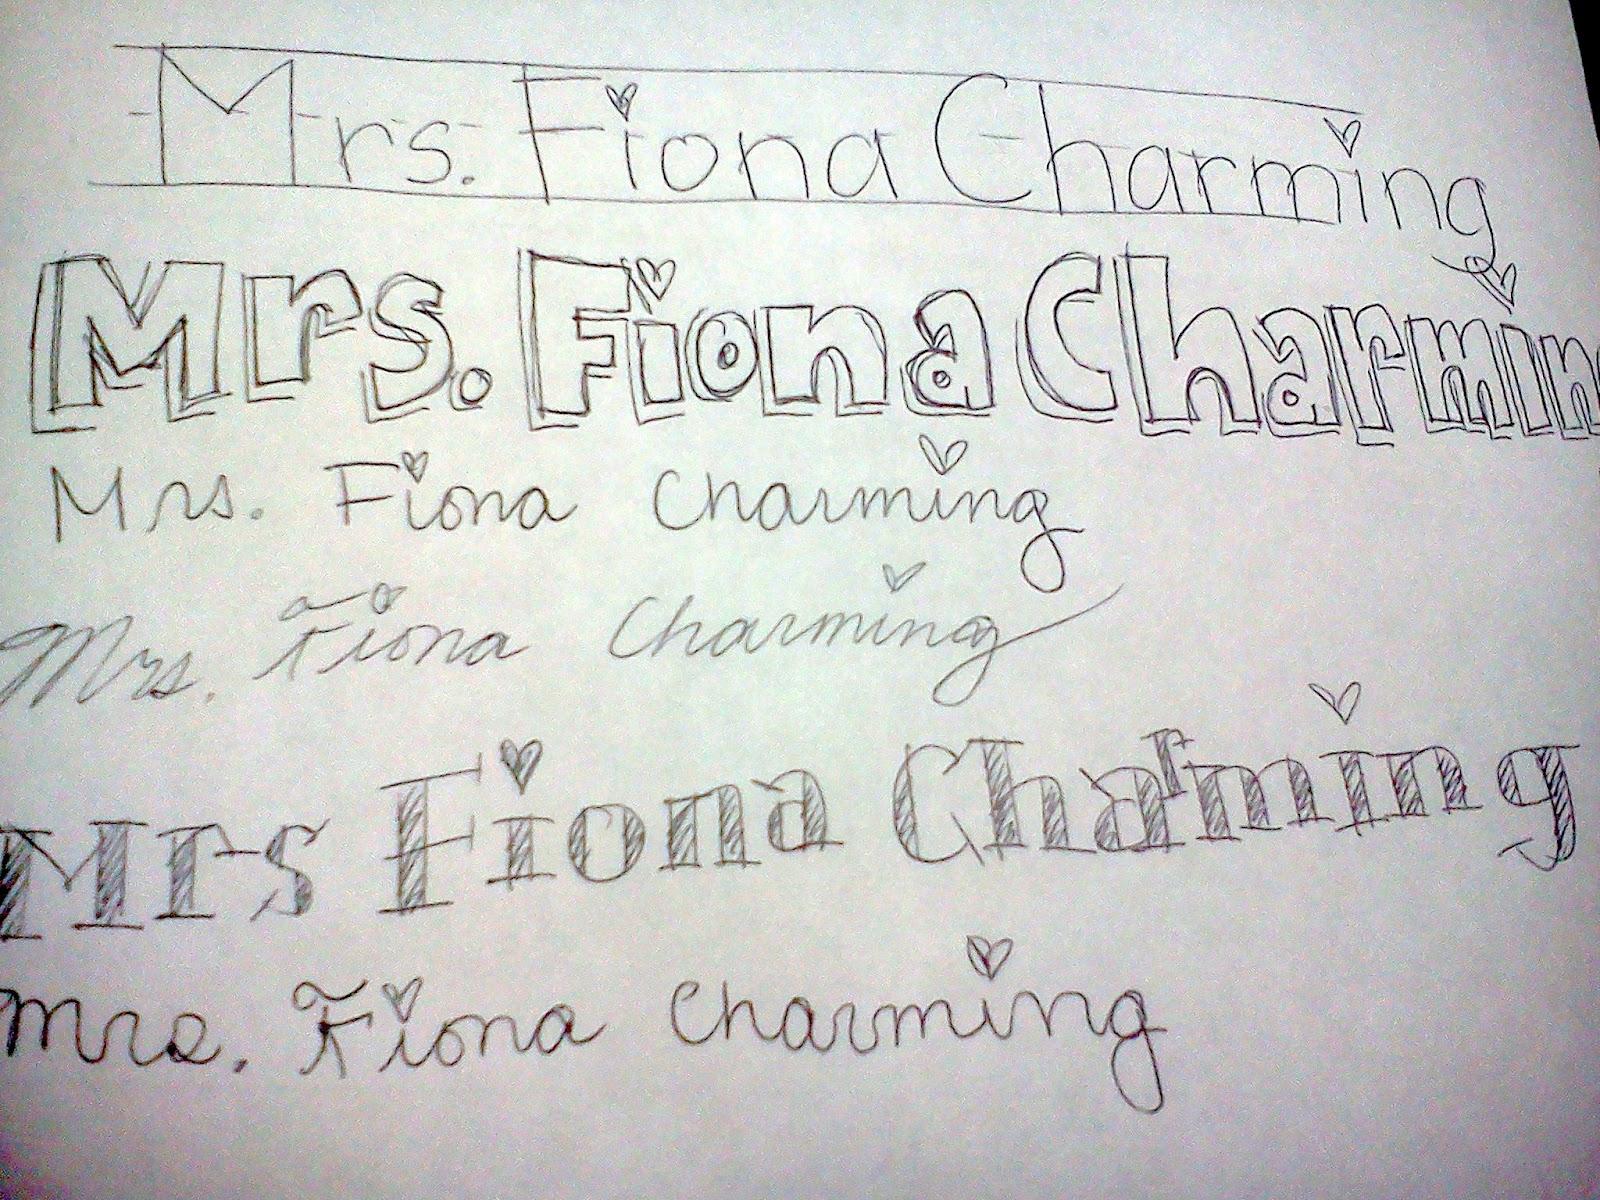 Mrs. Fiona Charming